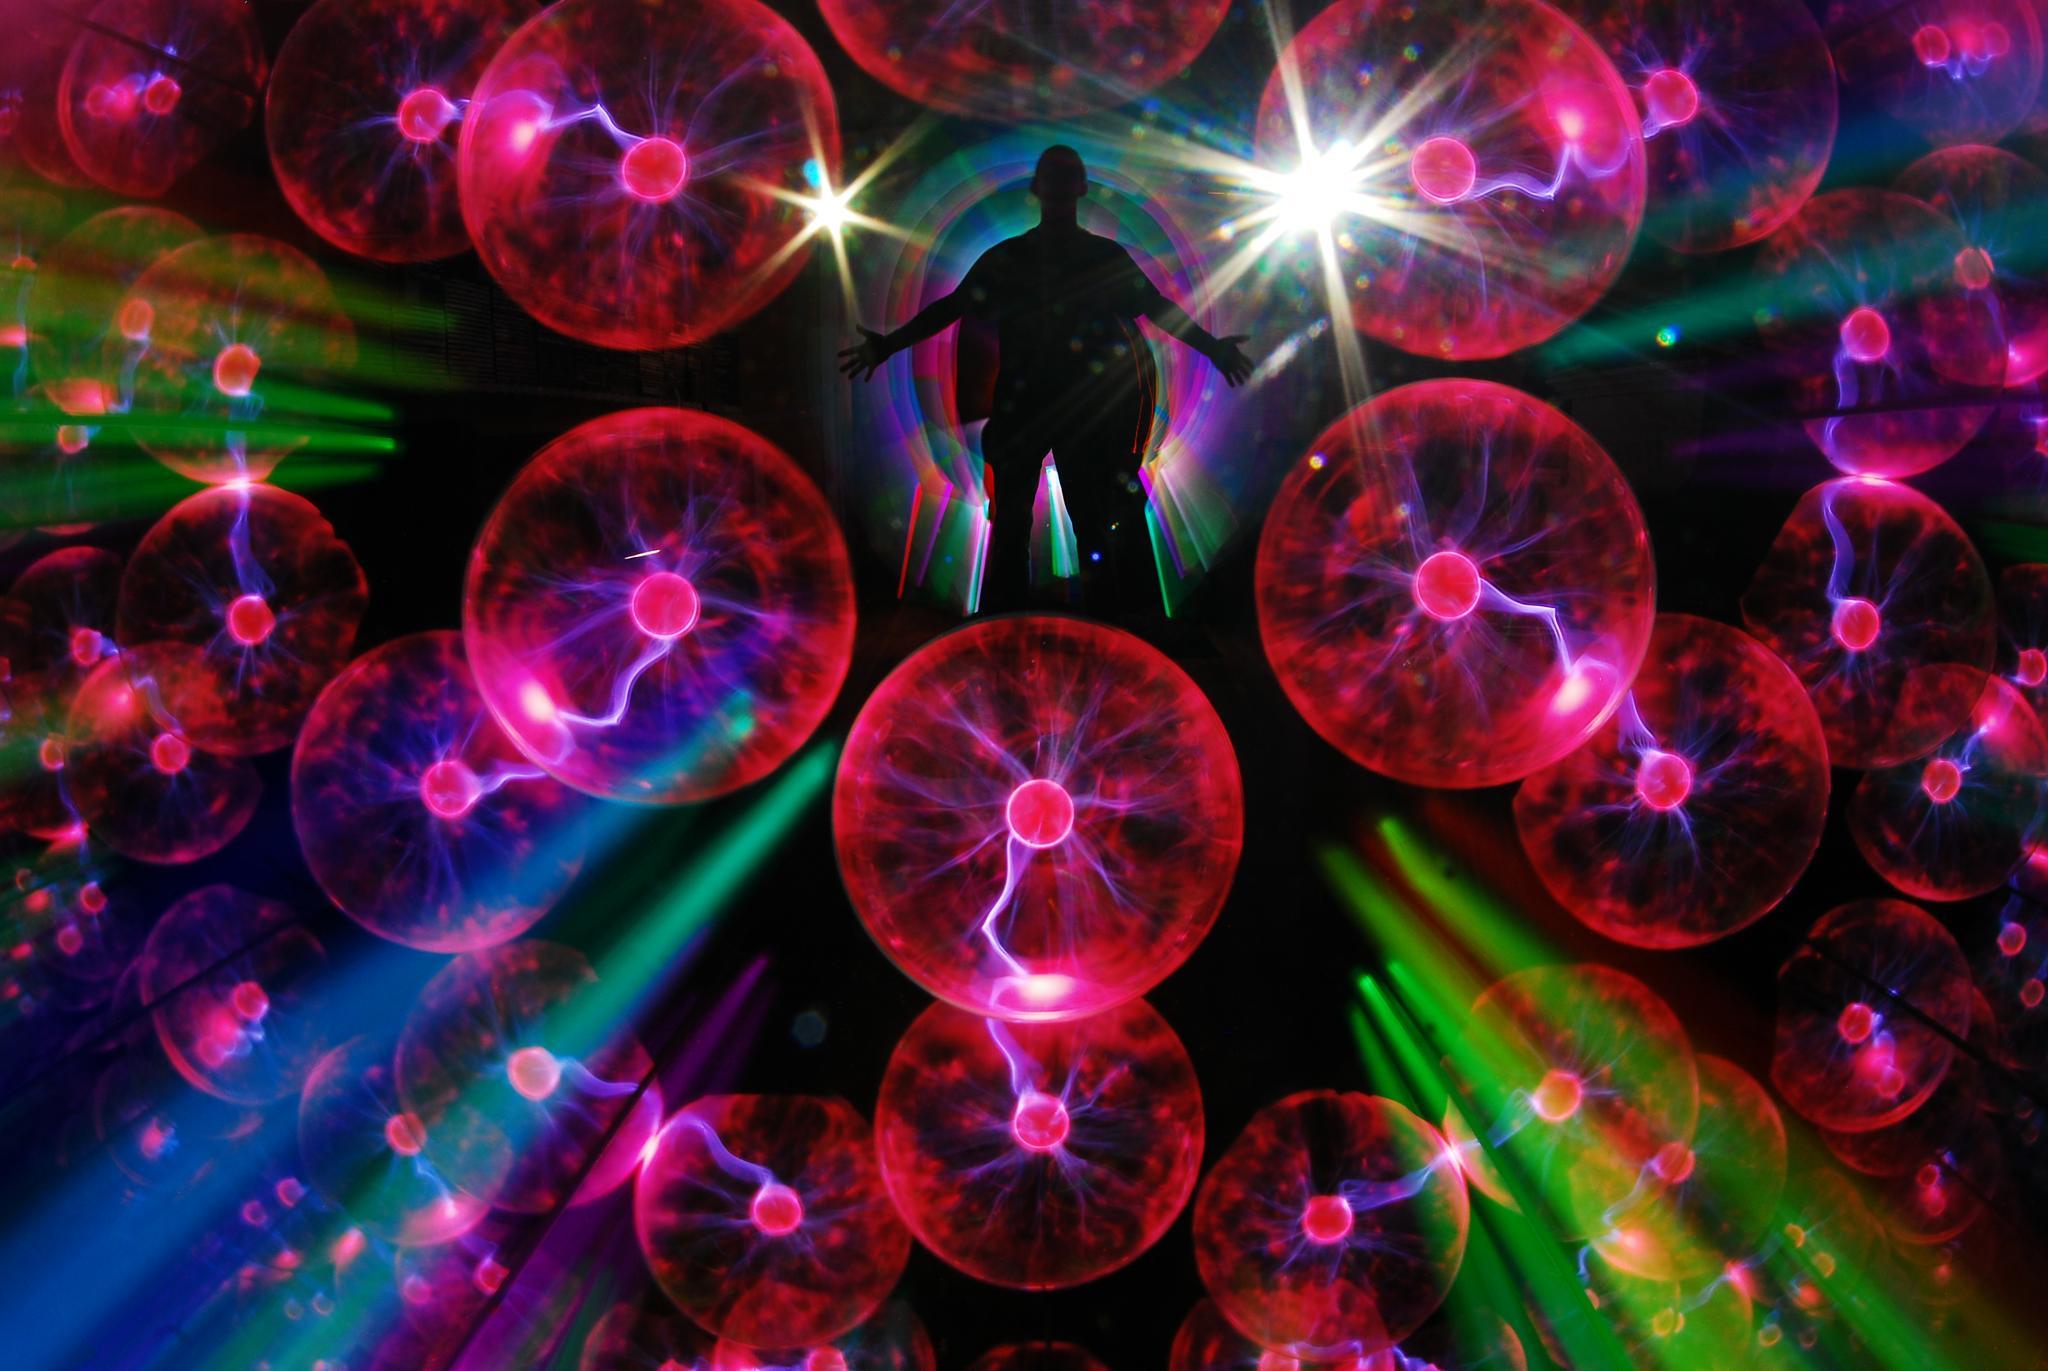 Kaleidoscopic Teleportation by JamesdeLunaLightpainting